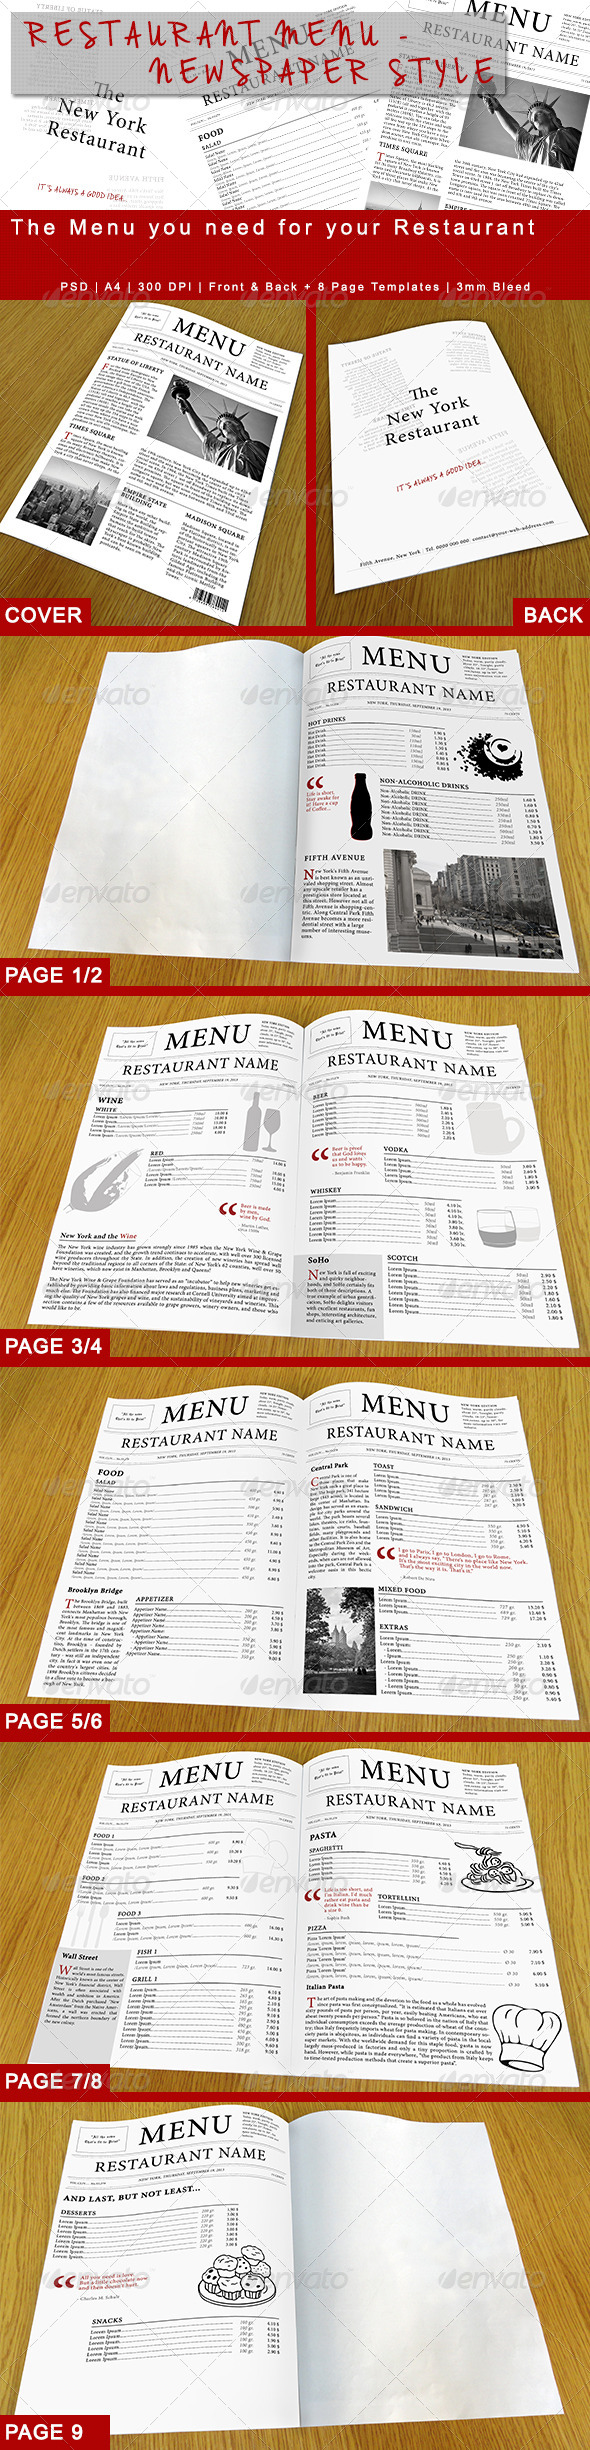 GraphicRiver Restaurant Menu Newspaper Style 5800575